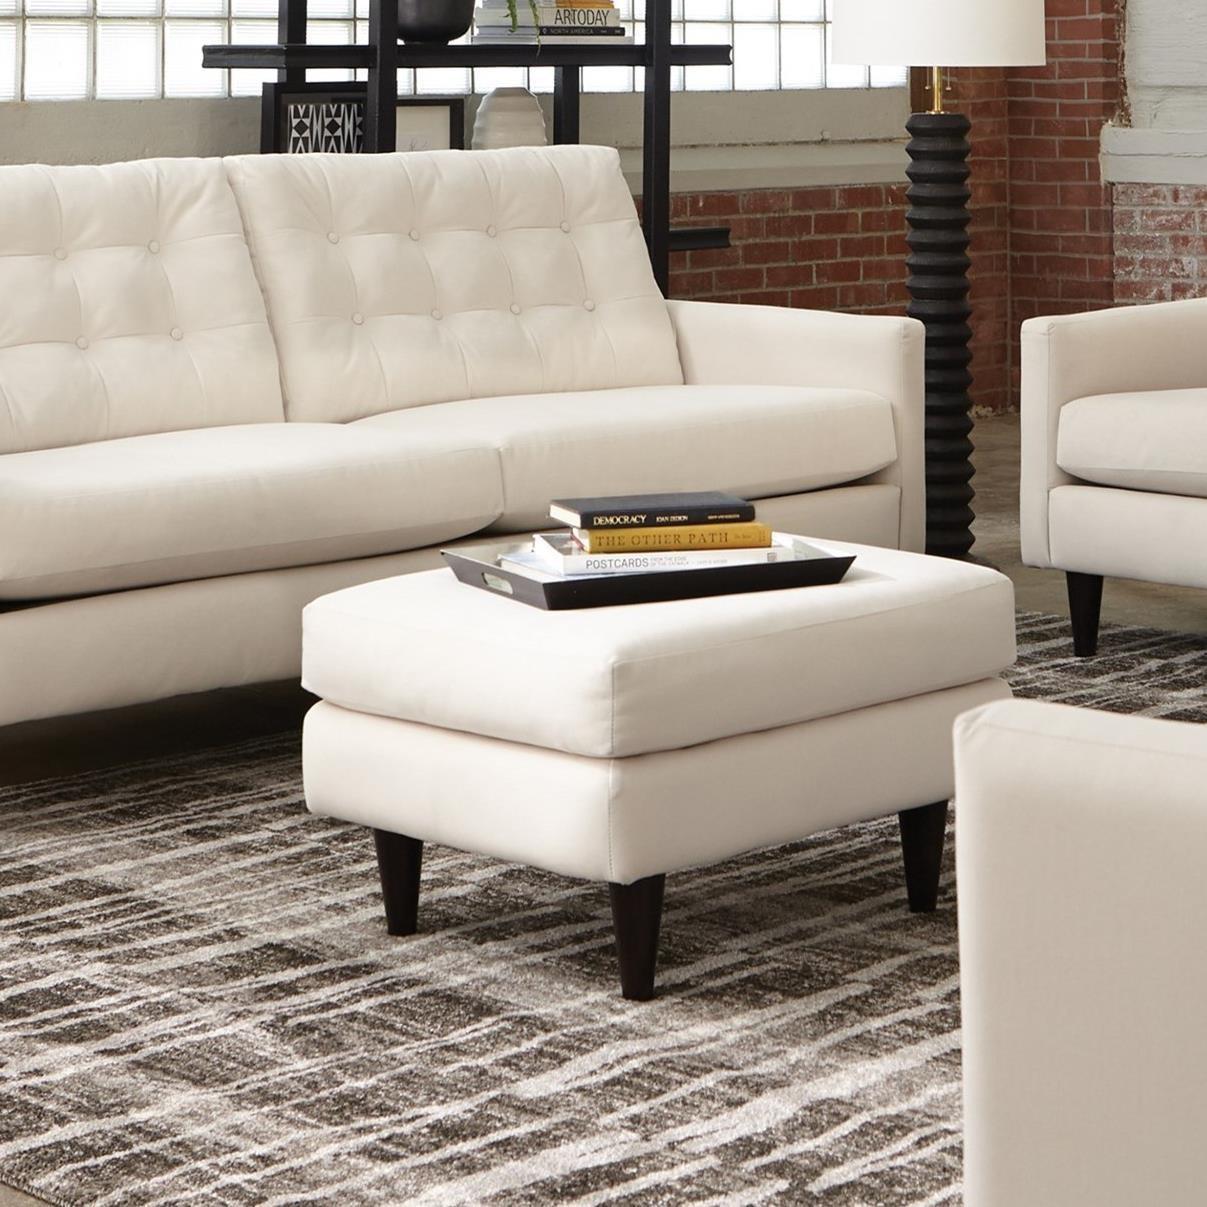 Superbe Jackson Furniture Haley Ottoman